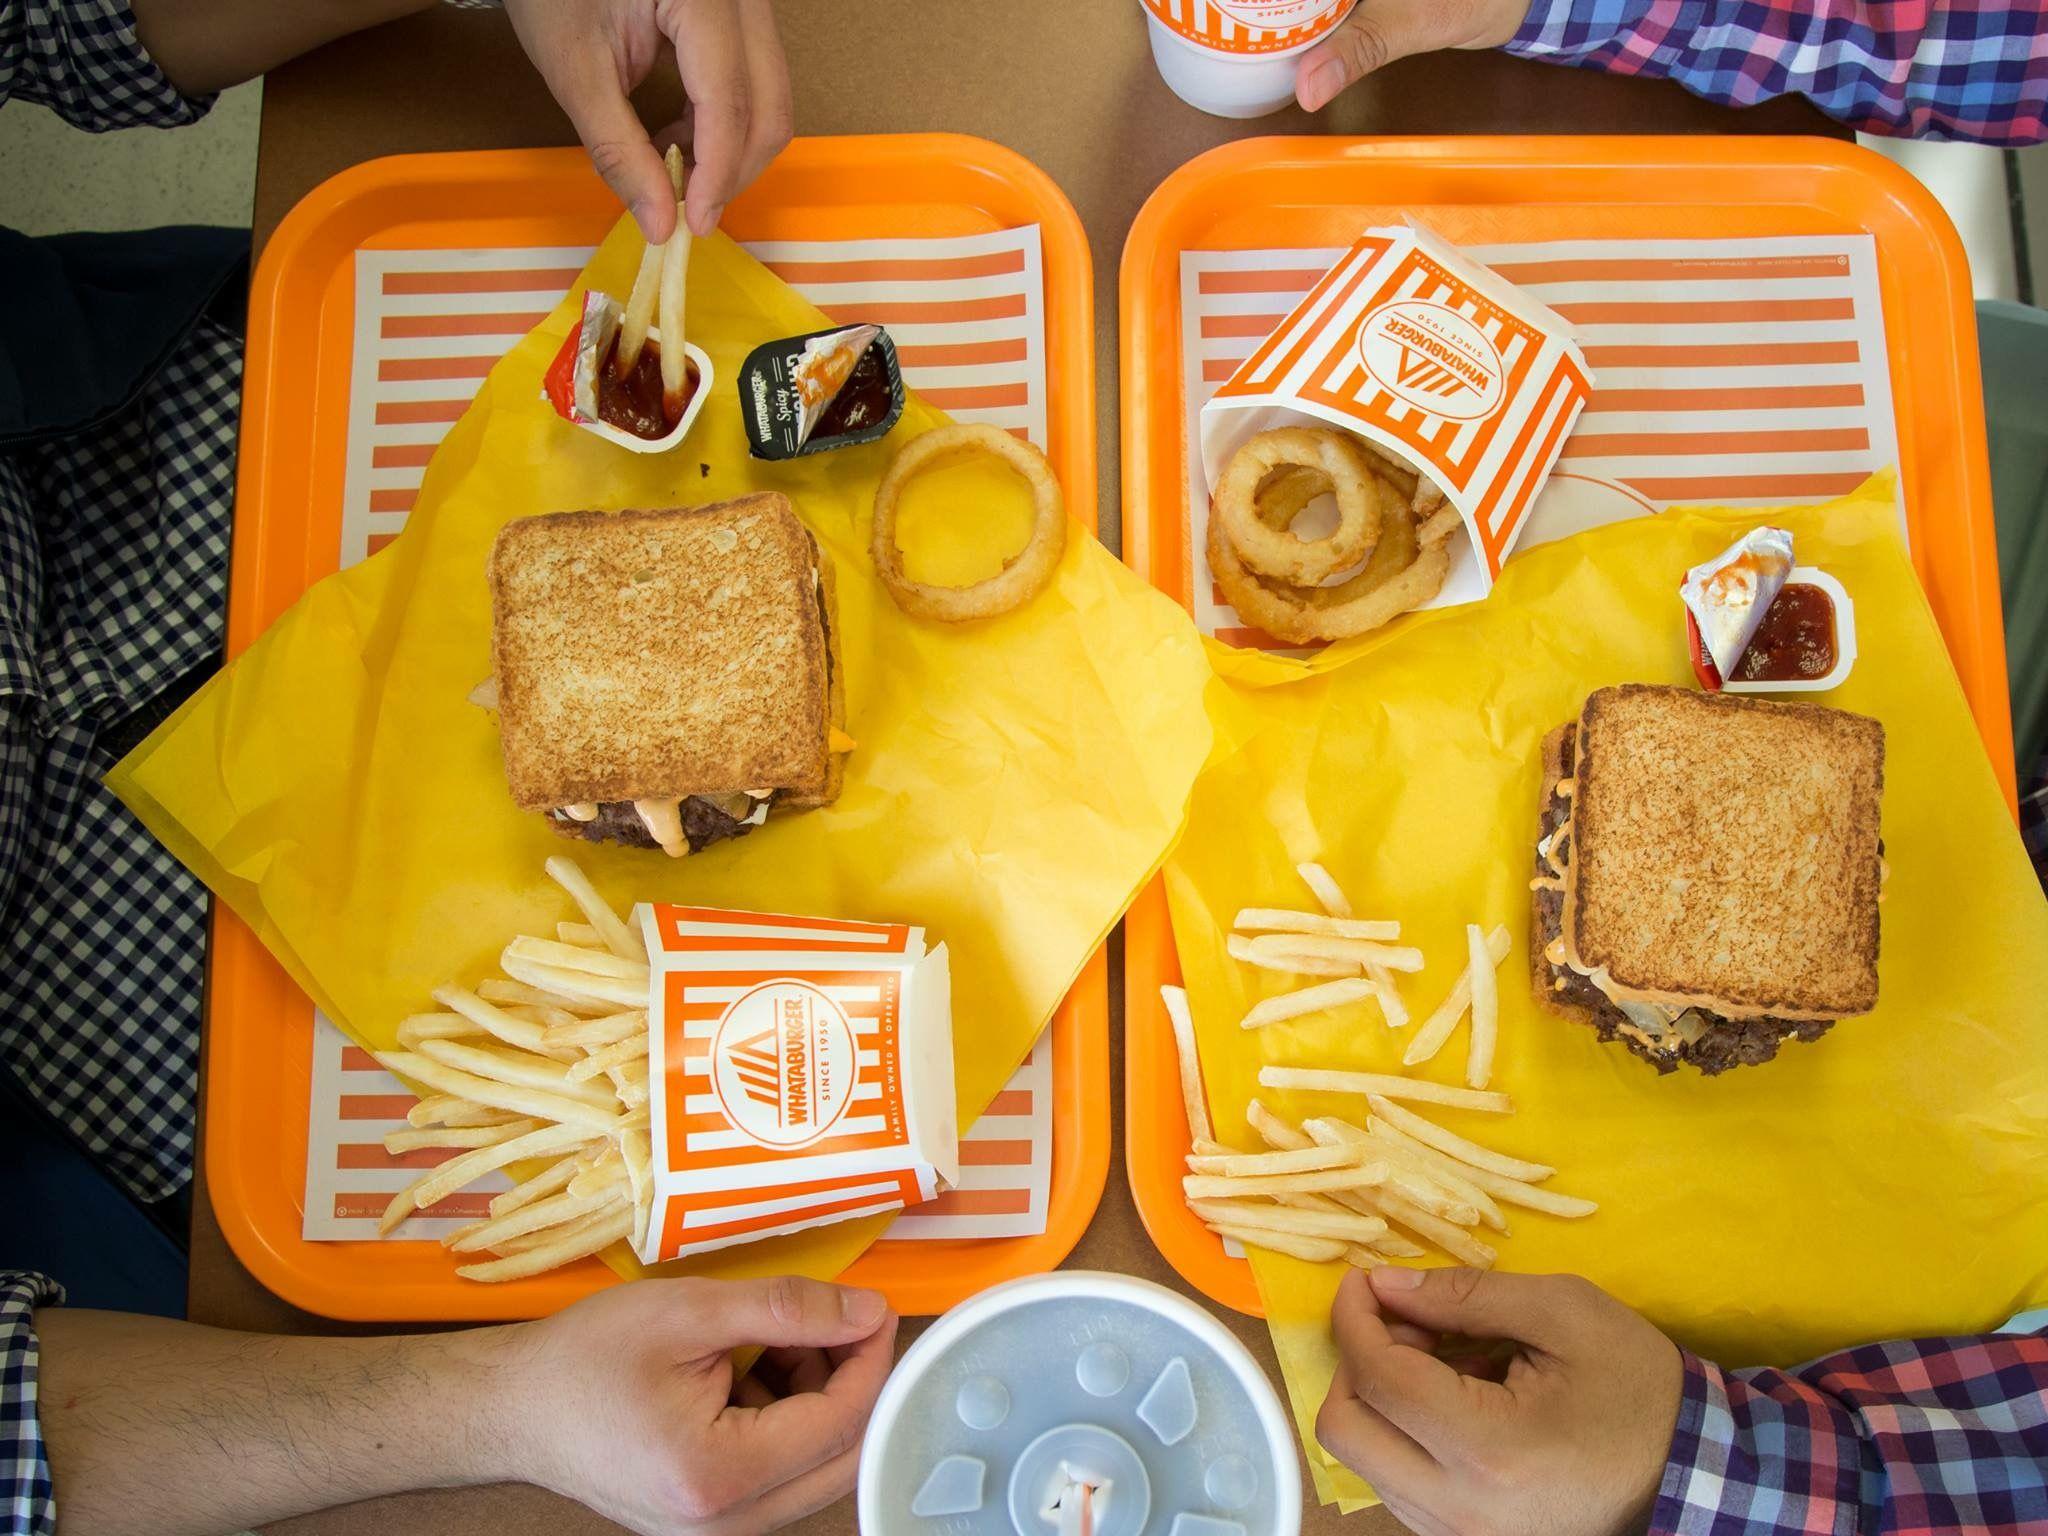 @whataburger Patty Melt Heaven. | Food, Patty melt, Whataburger patty melt